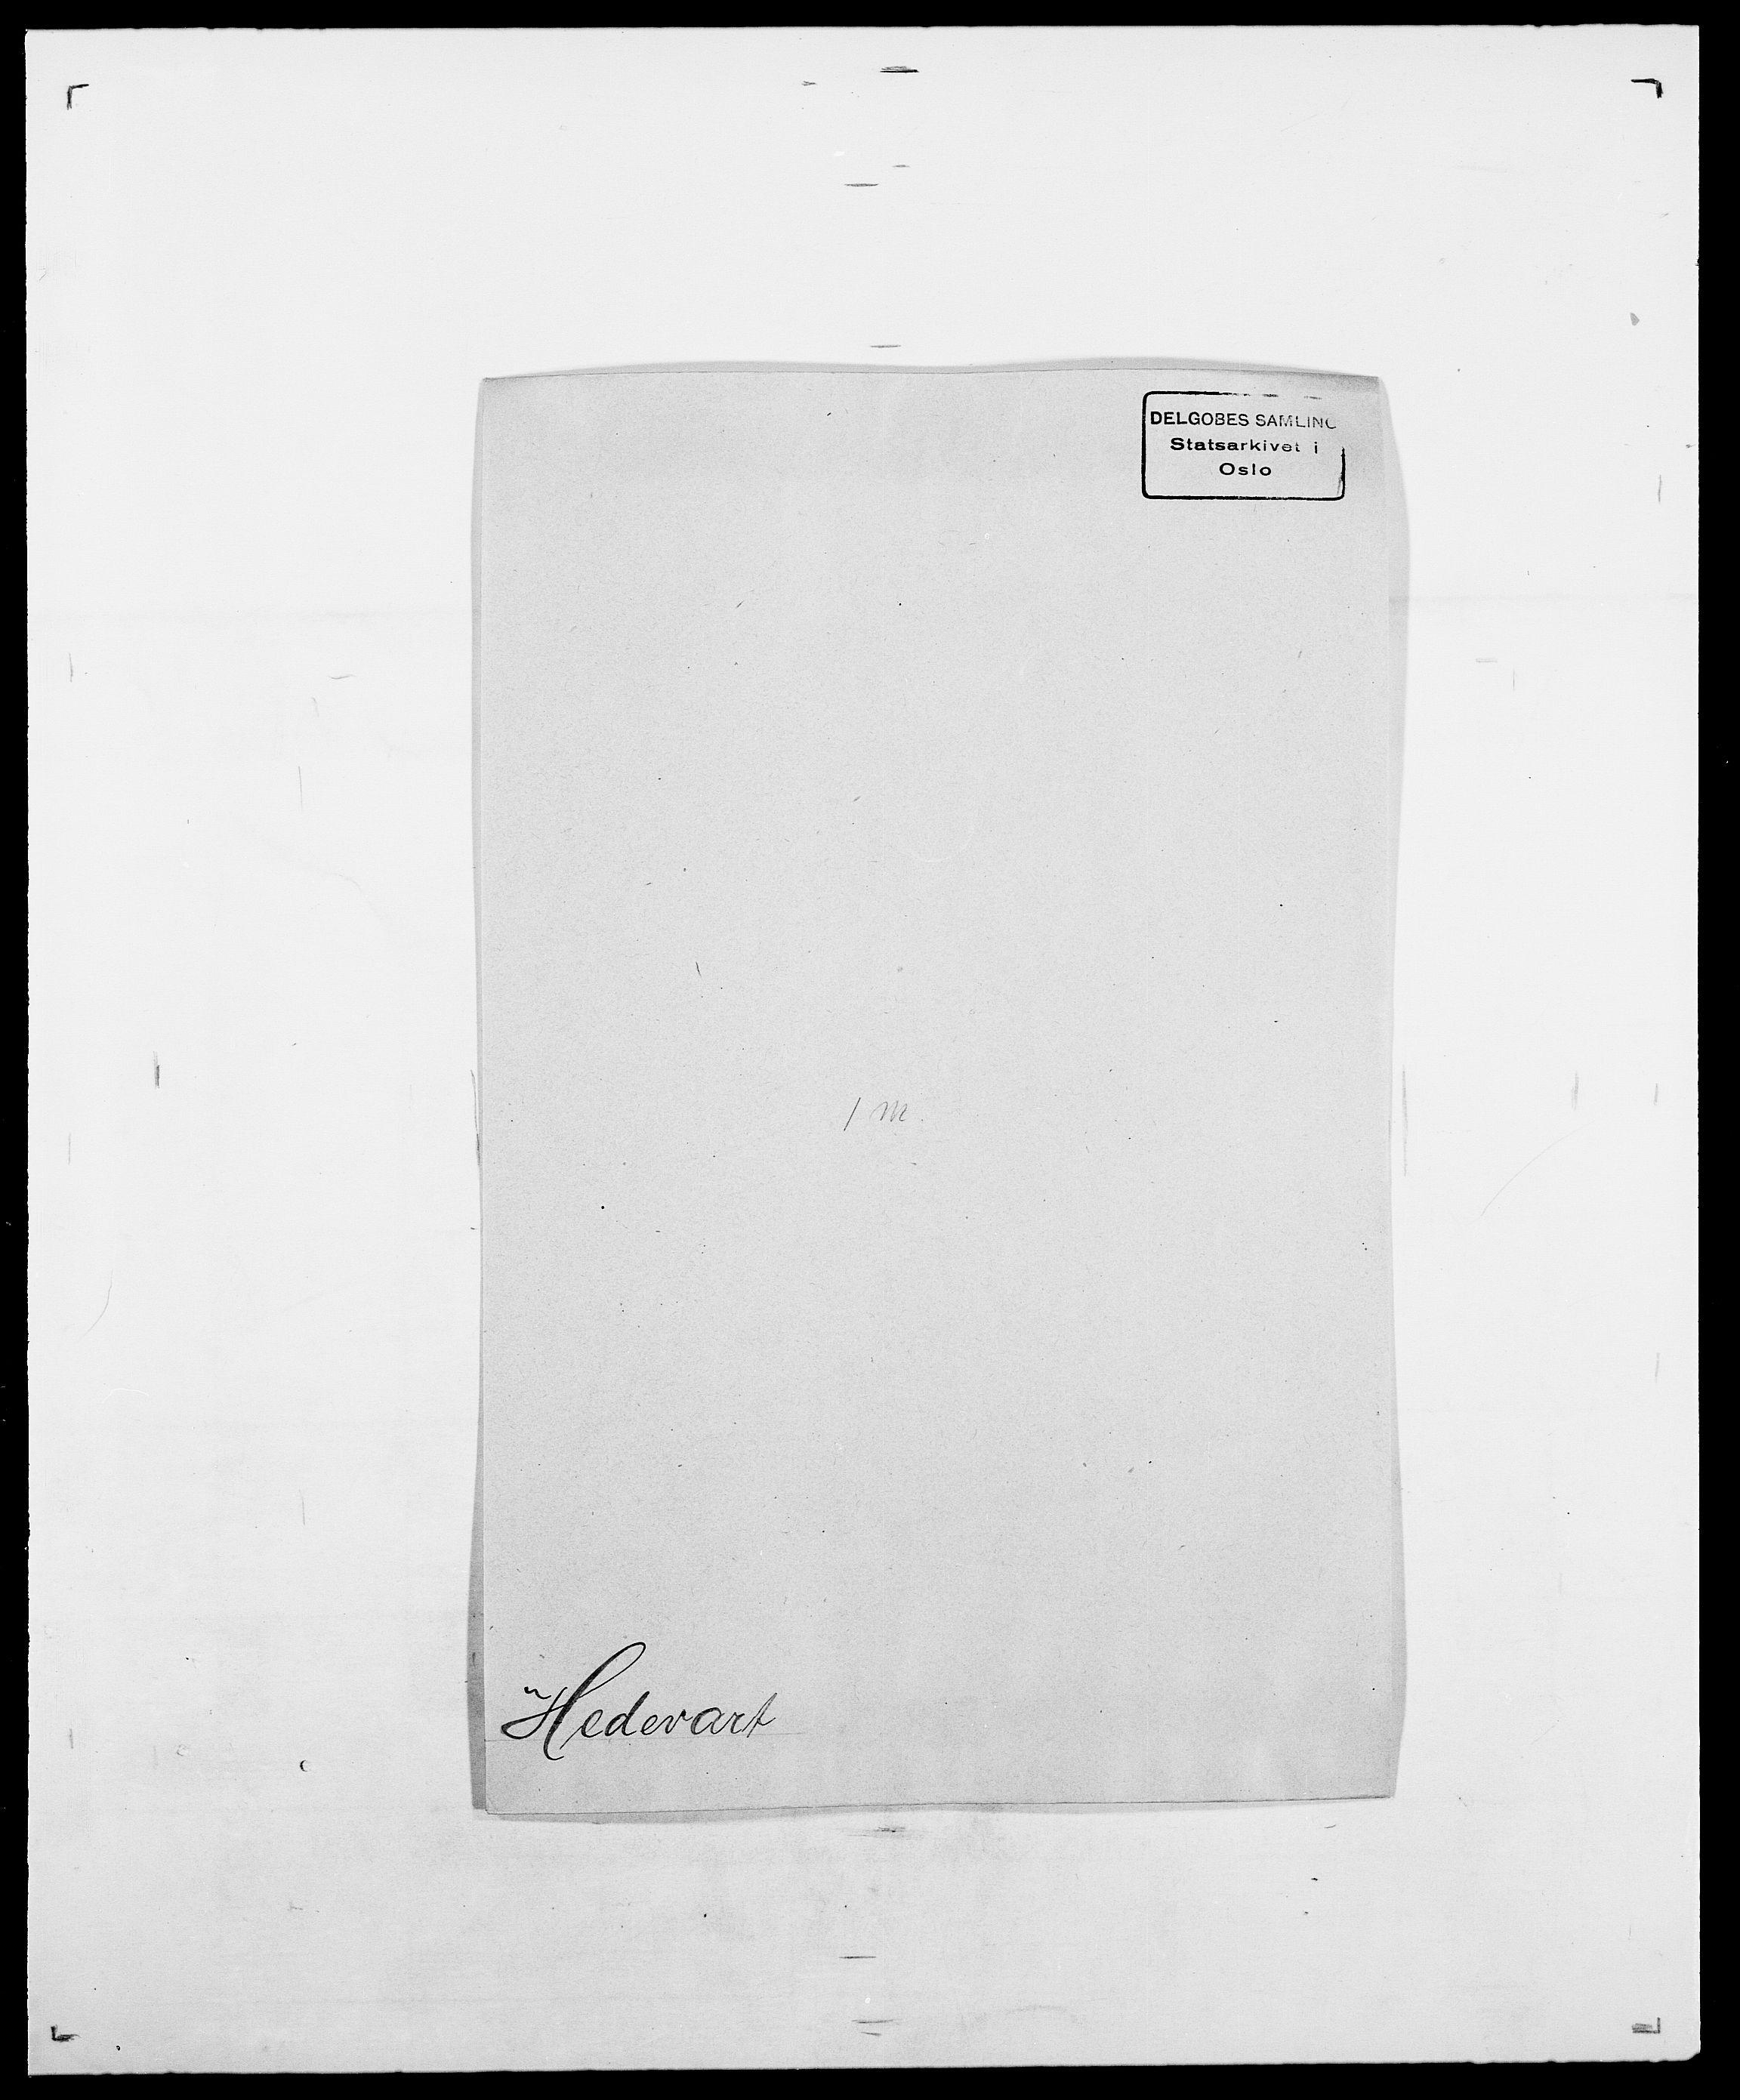 SAO, Delgobe, Charles Antoine - samling, D/Da/L0016: Hamborg - Hektoen, s. 675